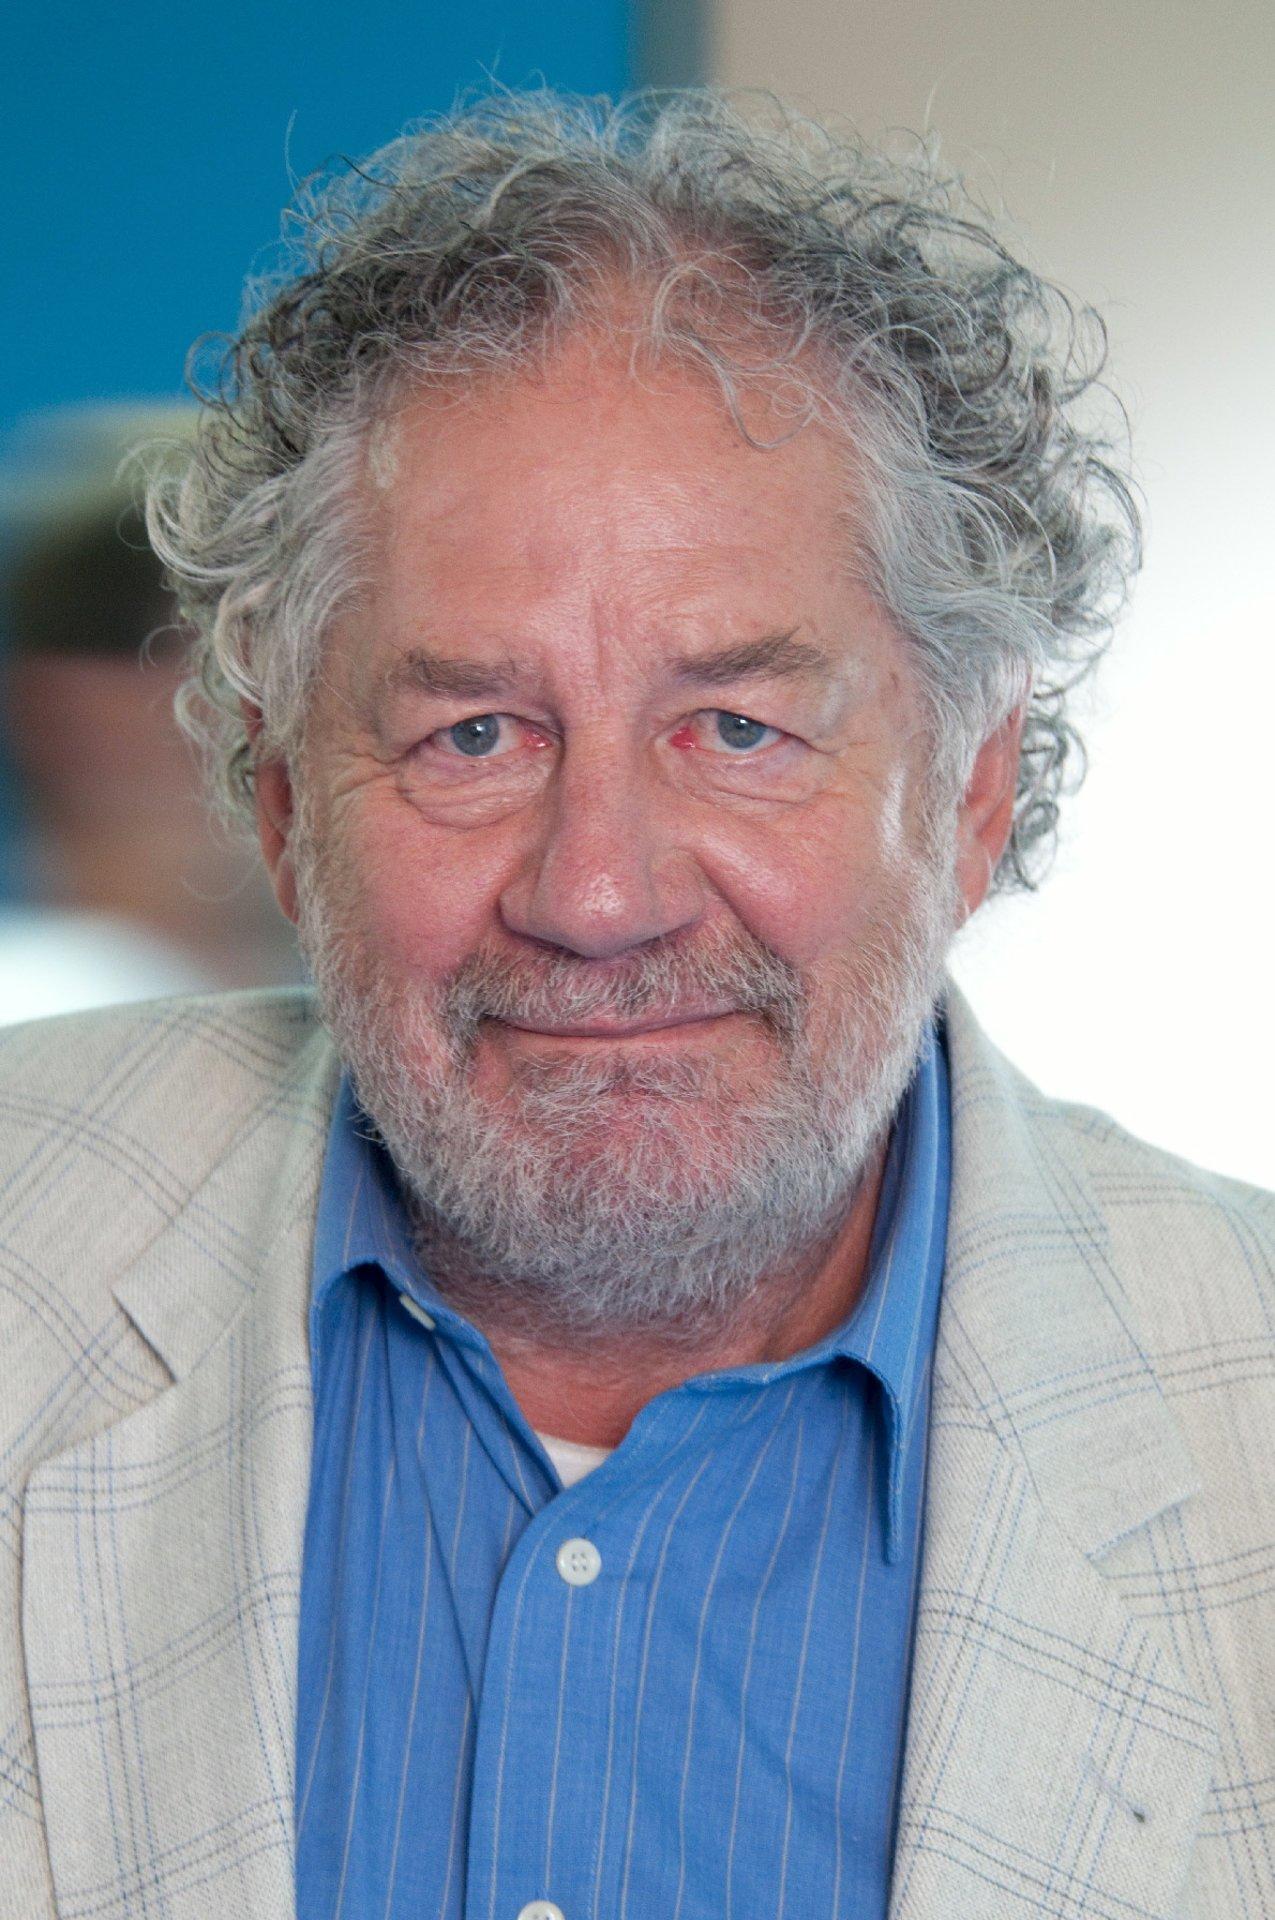 Chiem Van Houweninge